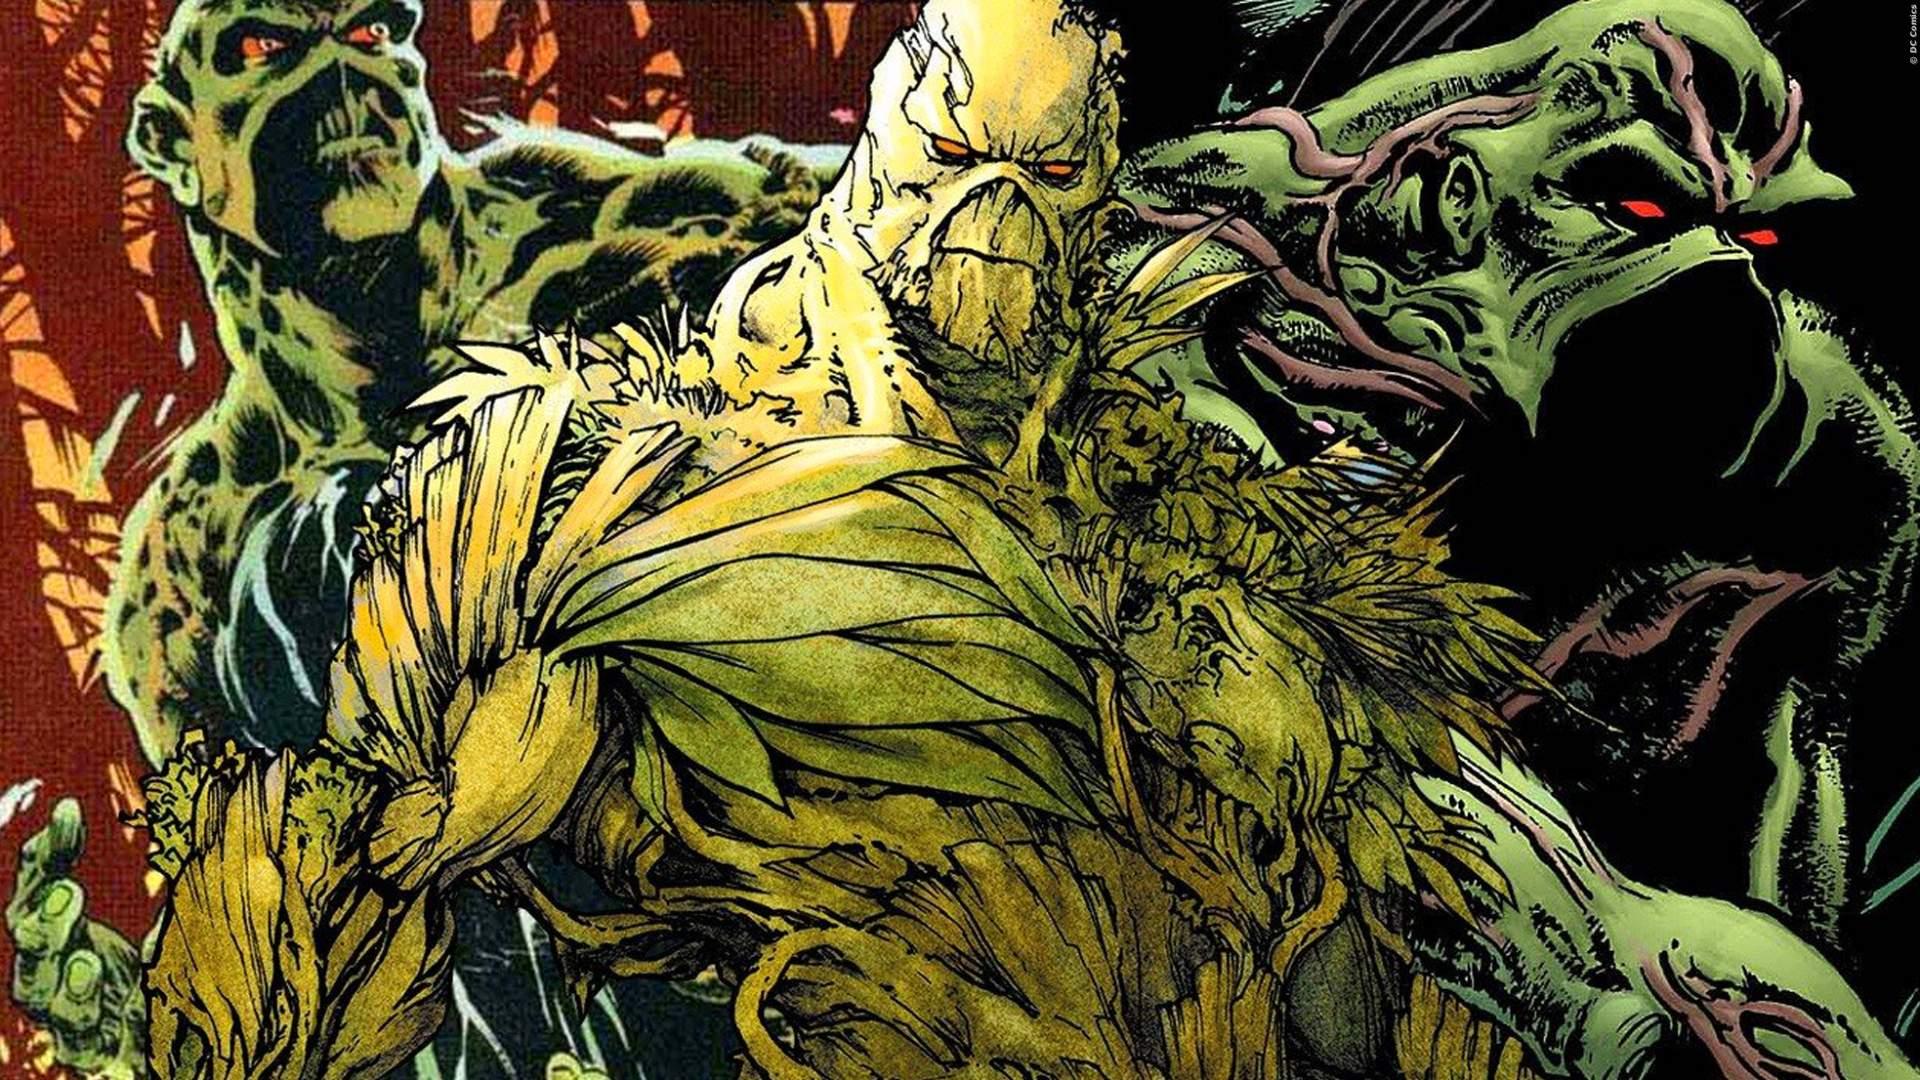 SWAMP THING: Erster Trailer zeigt das DC-Monster